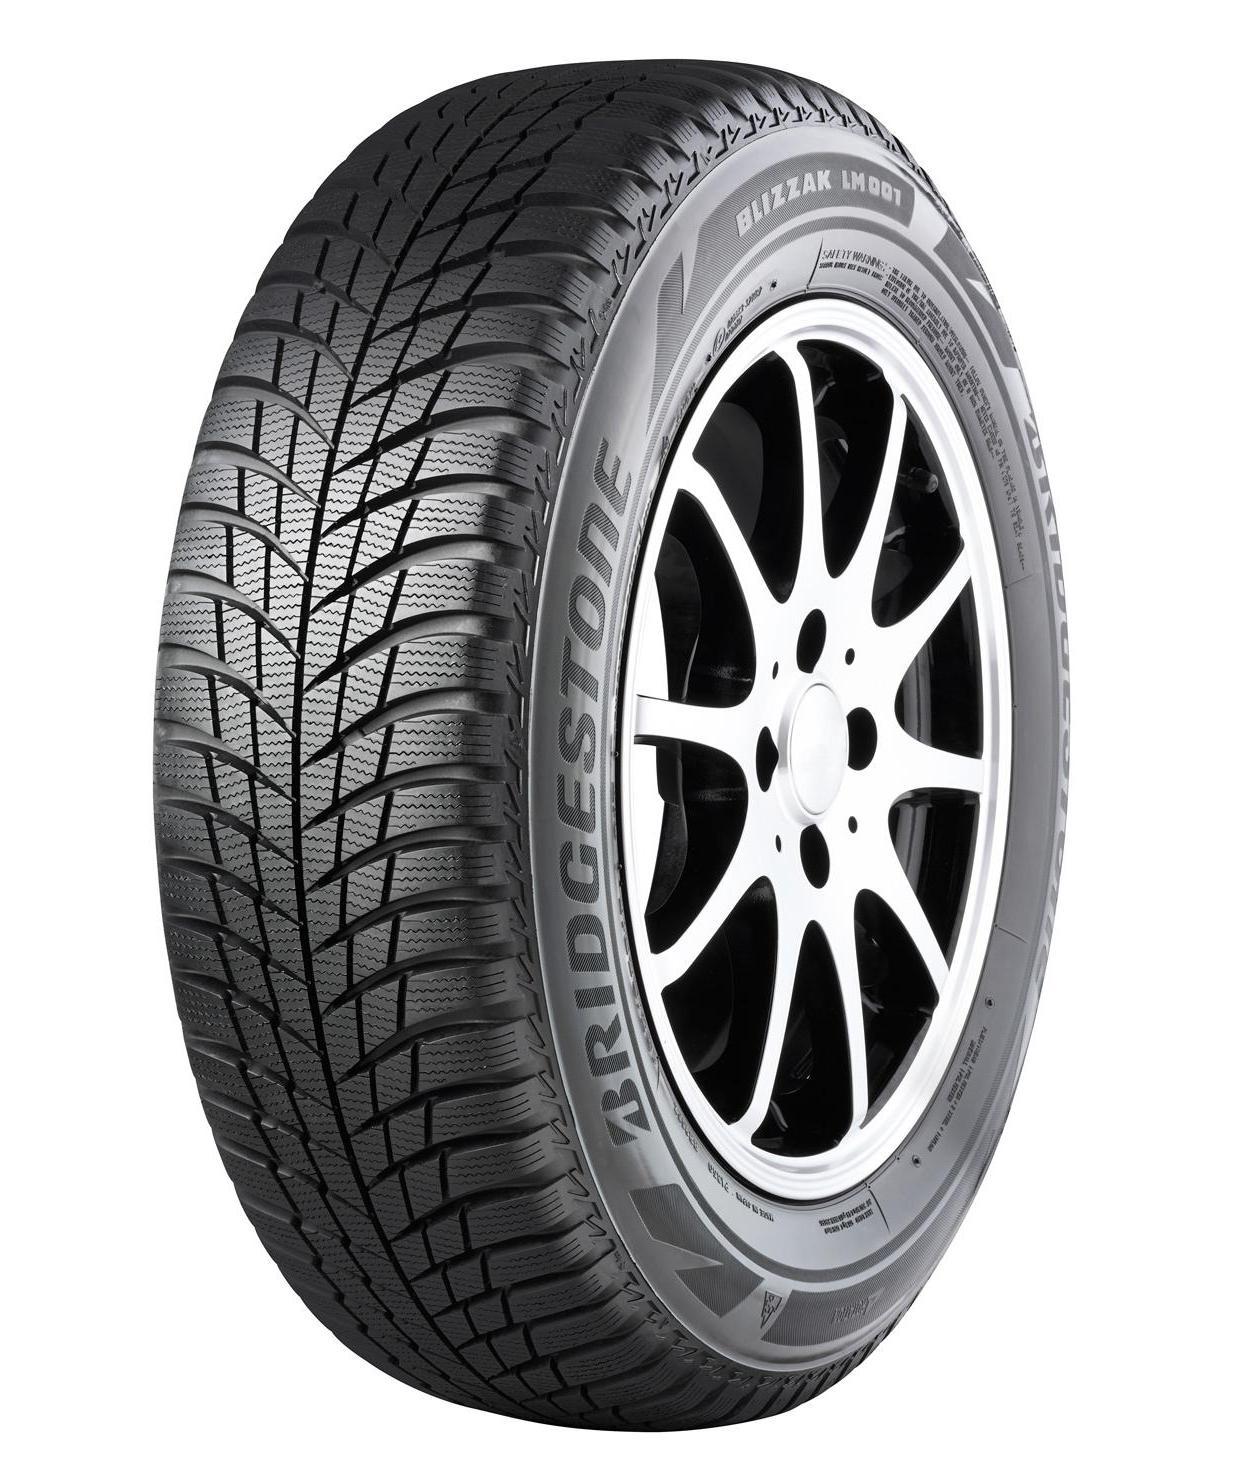 Bridgestone Blizzak LM 001195/65 R15